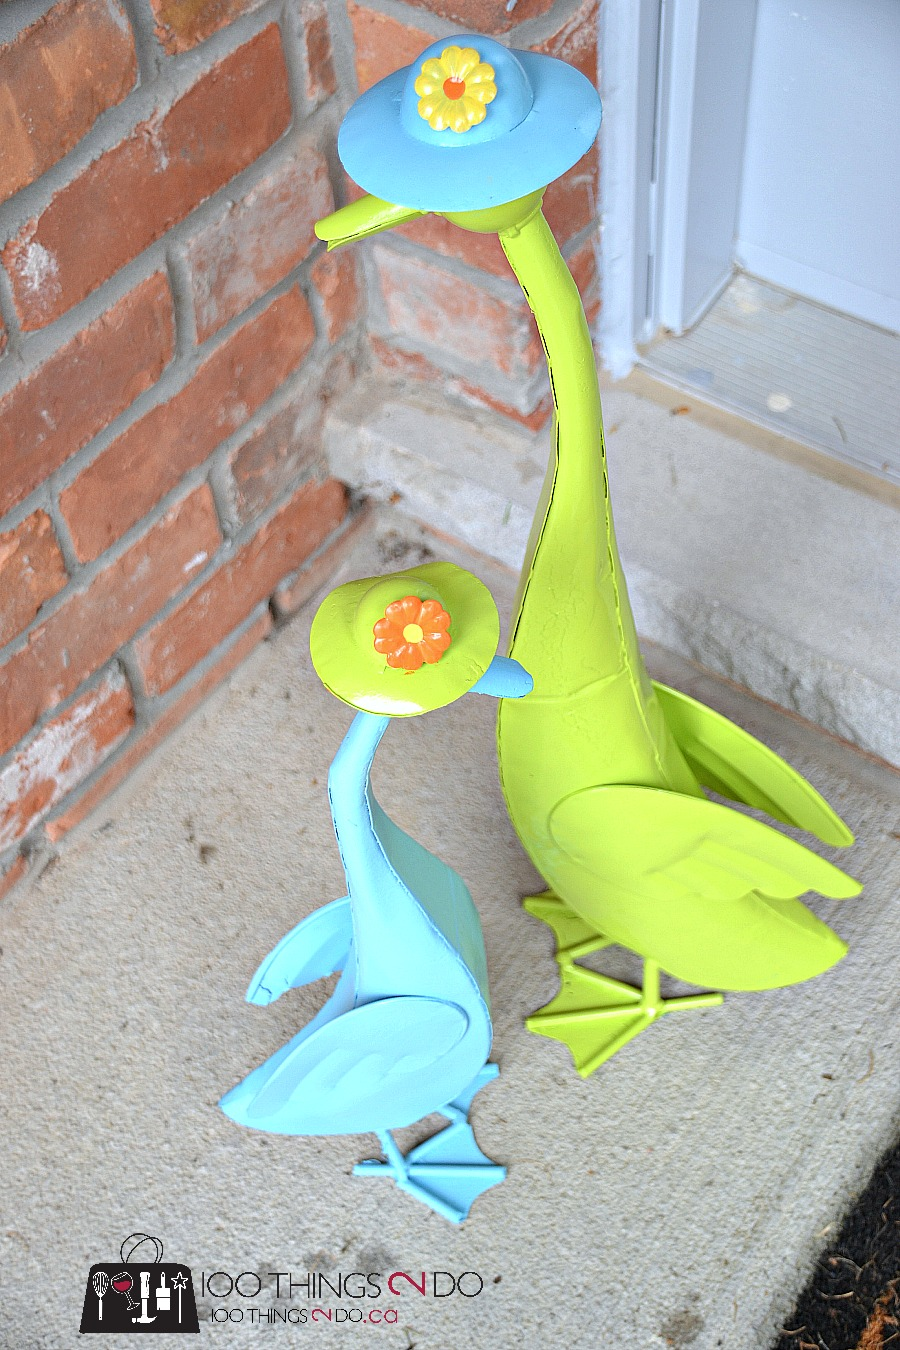 Metal Garden Art - refinishing our ducks